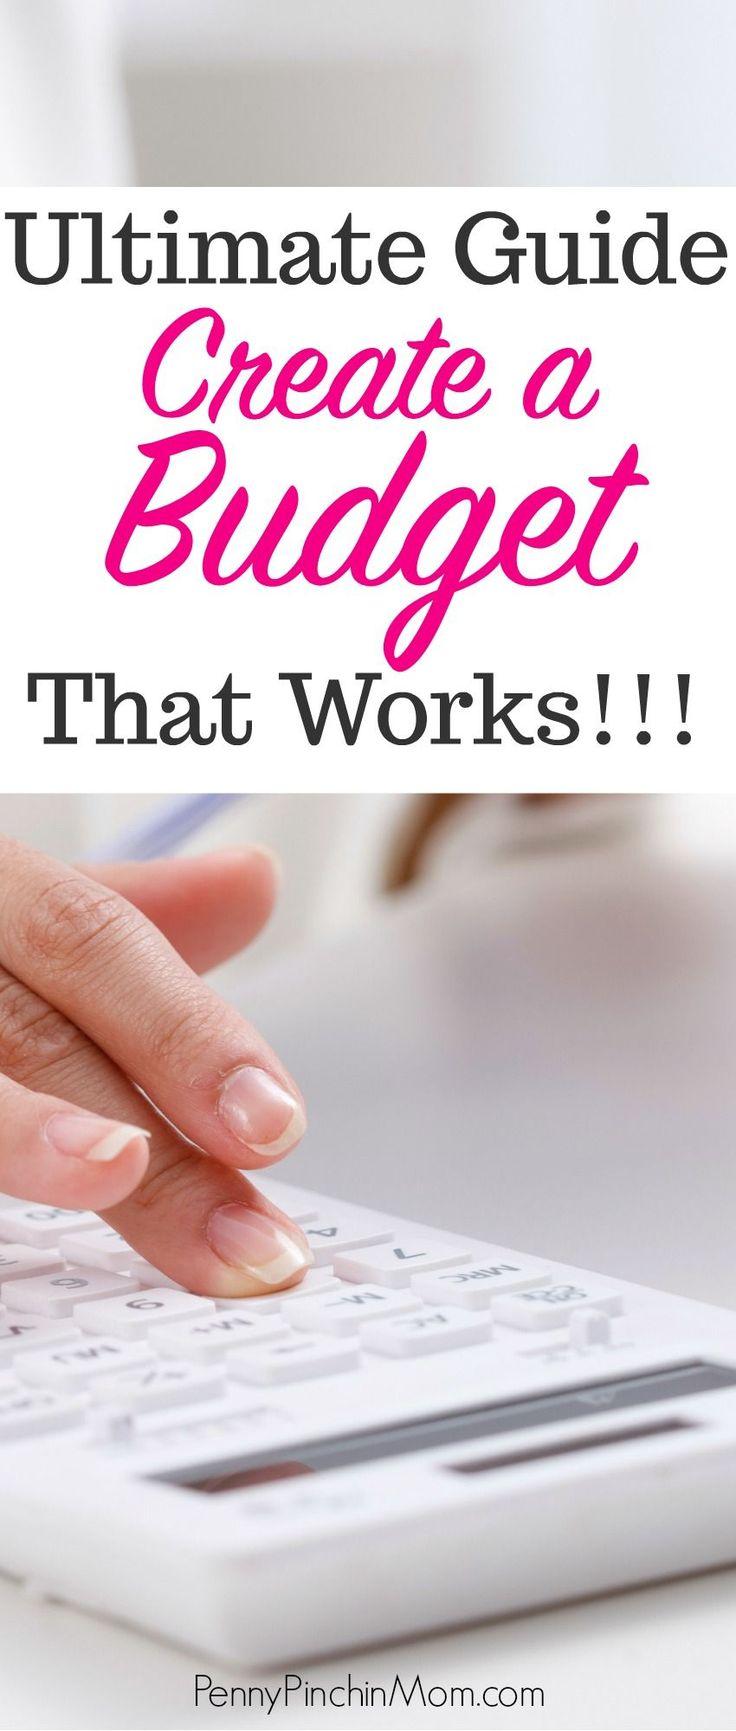 Budgeting - How to make a budget    Budget for beginngers   how to budget   budget printable   budget templates   how to budget   Budget 101    #budget  #budgeting   #howtobudget  #createabudget  #moneymanagement  #personalfinance  #money